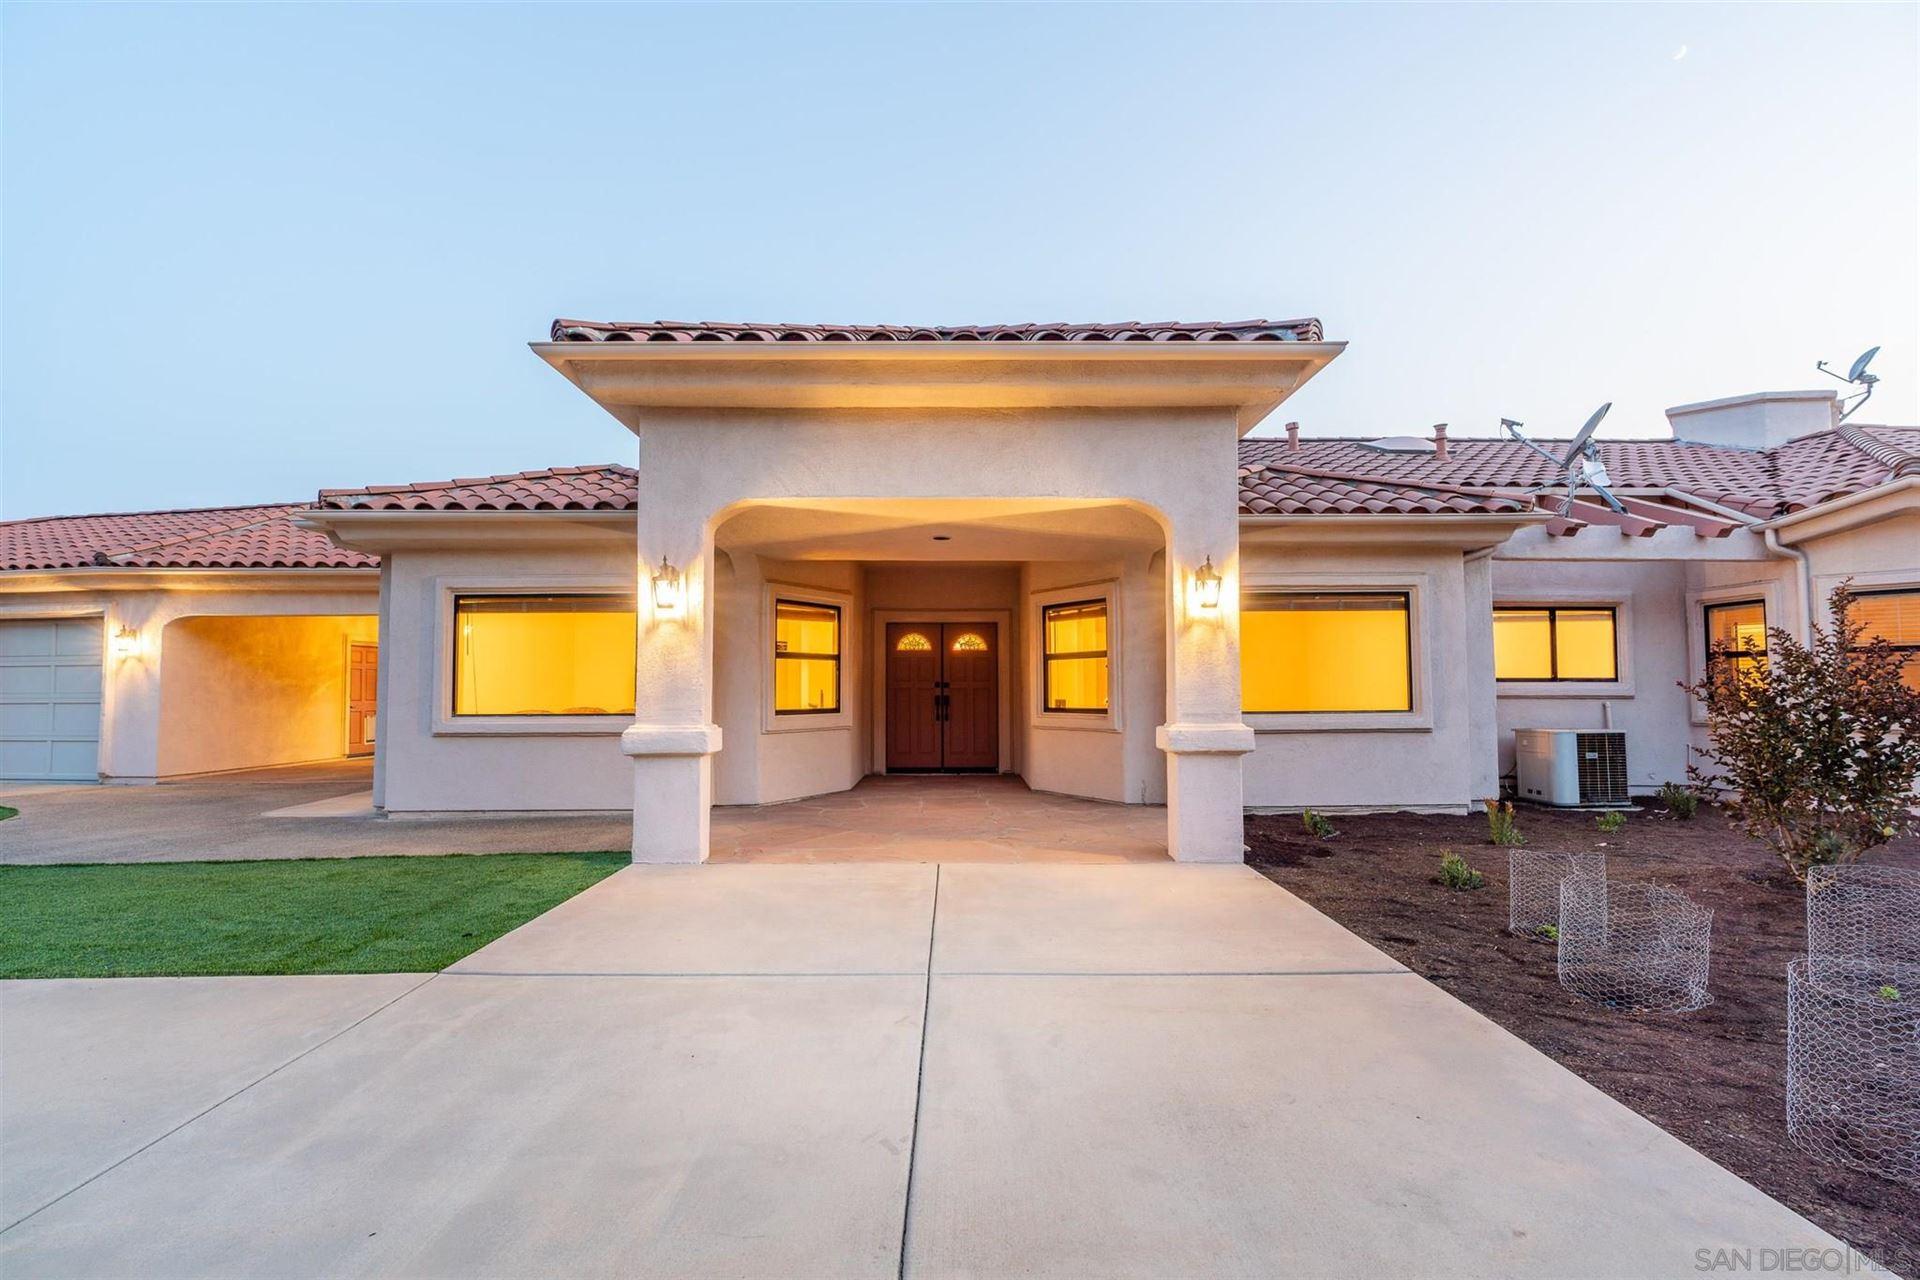 Photo of 9340 Huntley Rd, Fallbrook, CA 92028 (MLS # 210020265)